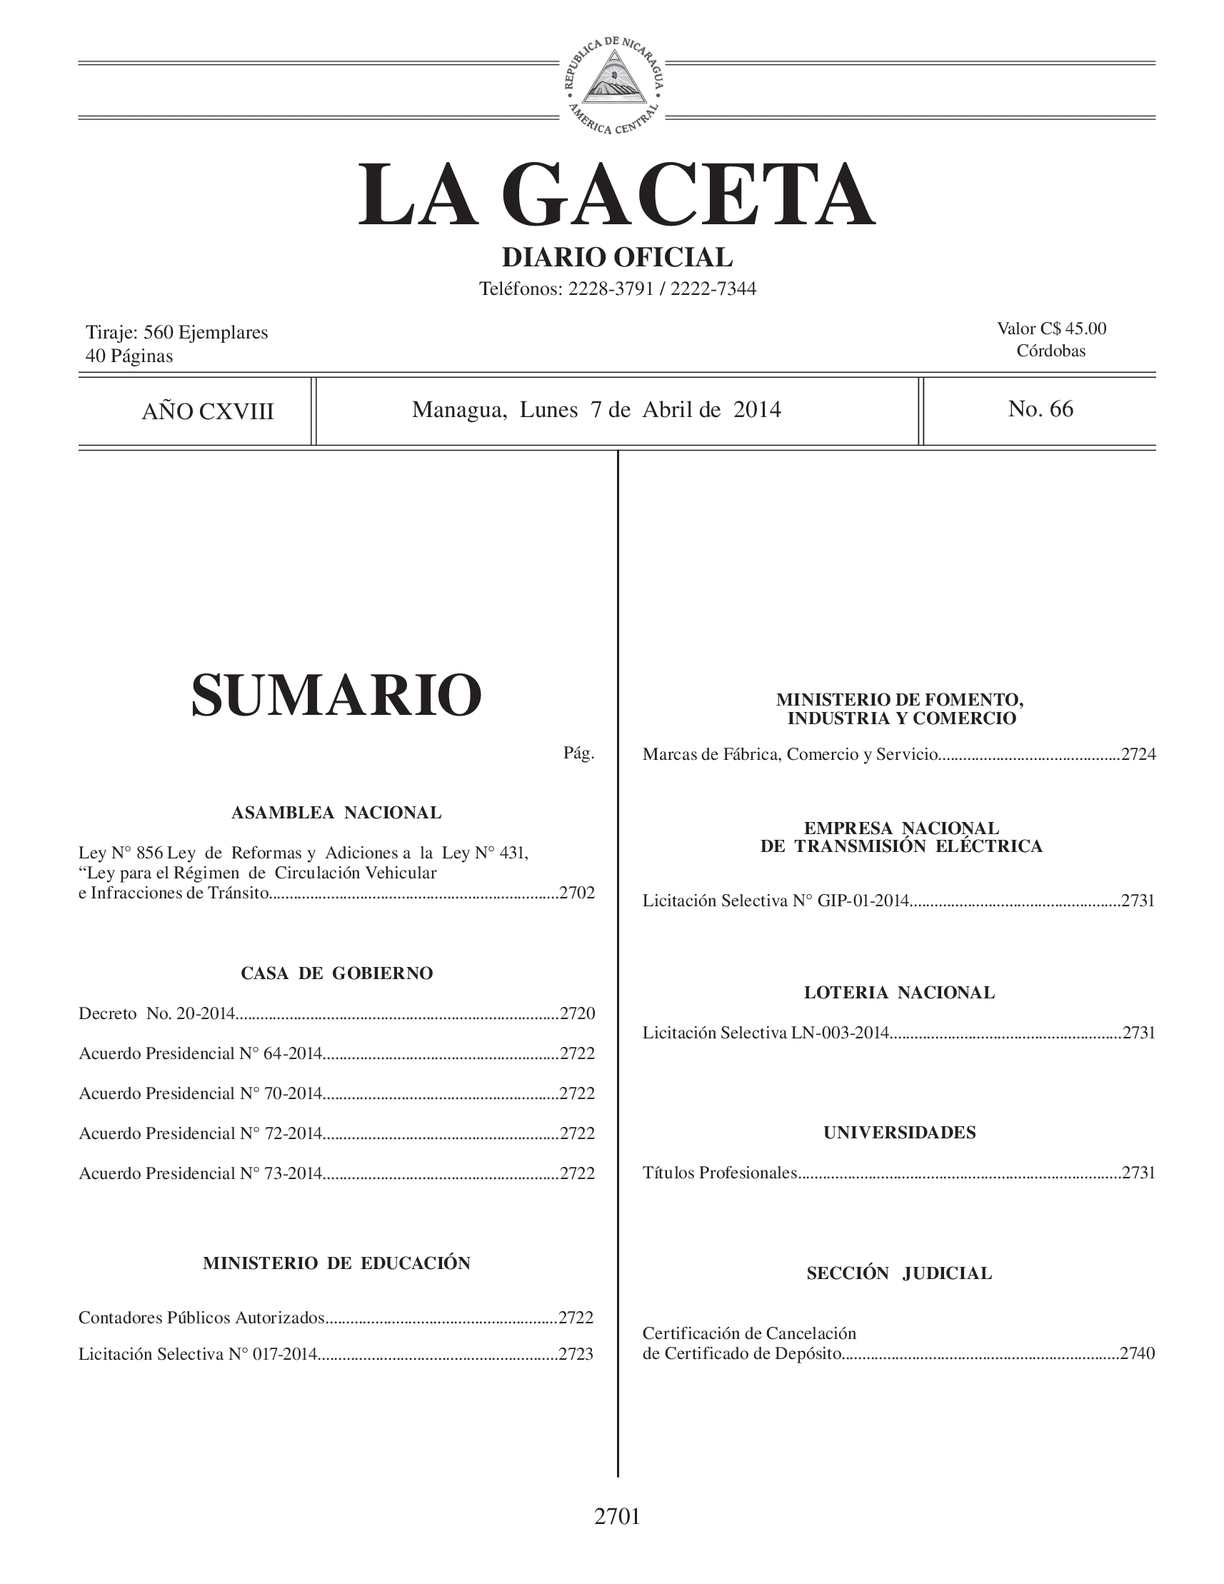 66 Gaceta, Lunes 7 De Abril De 2014